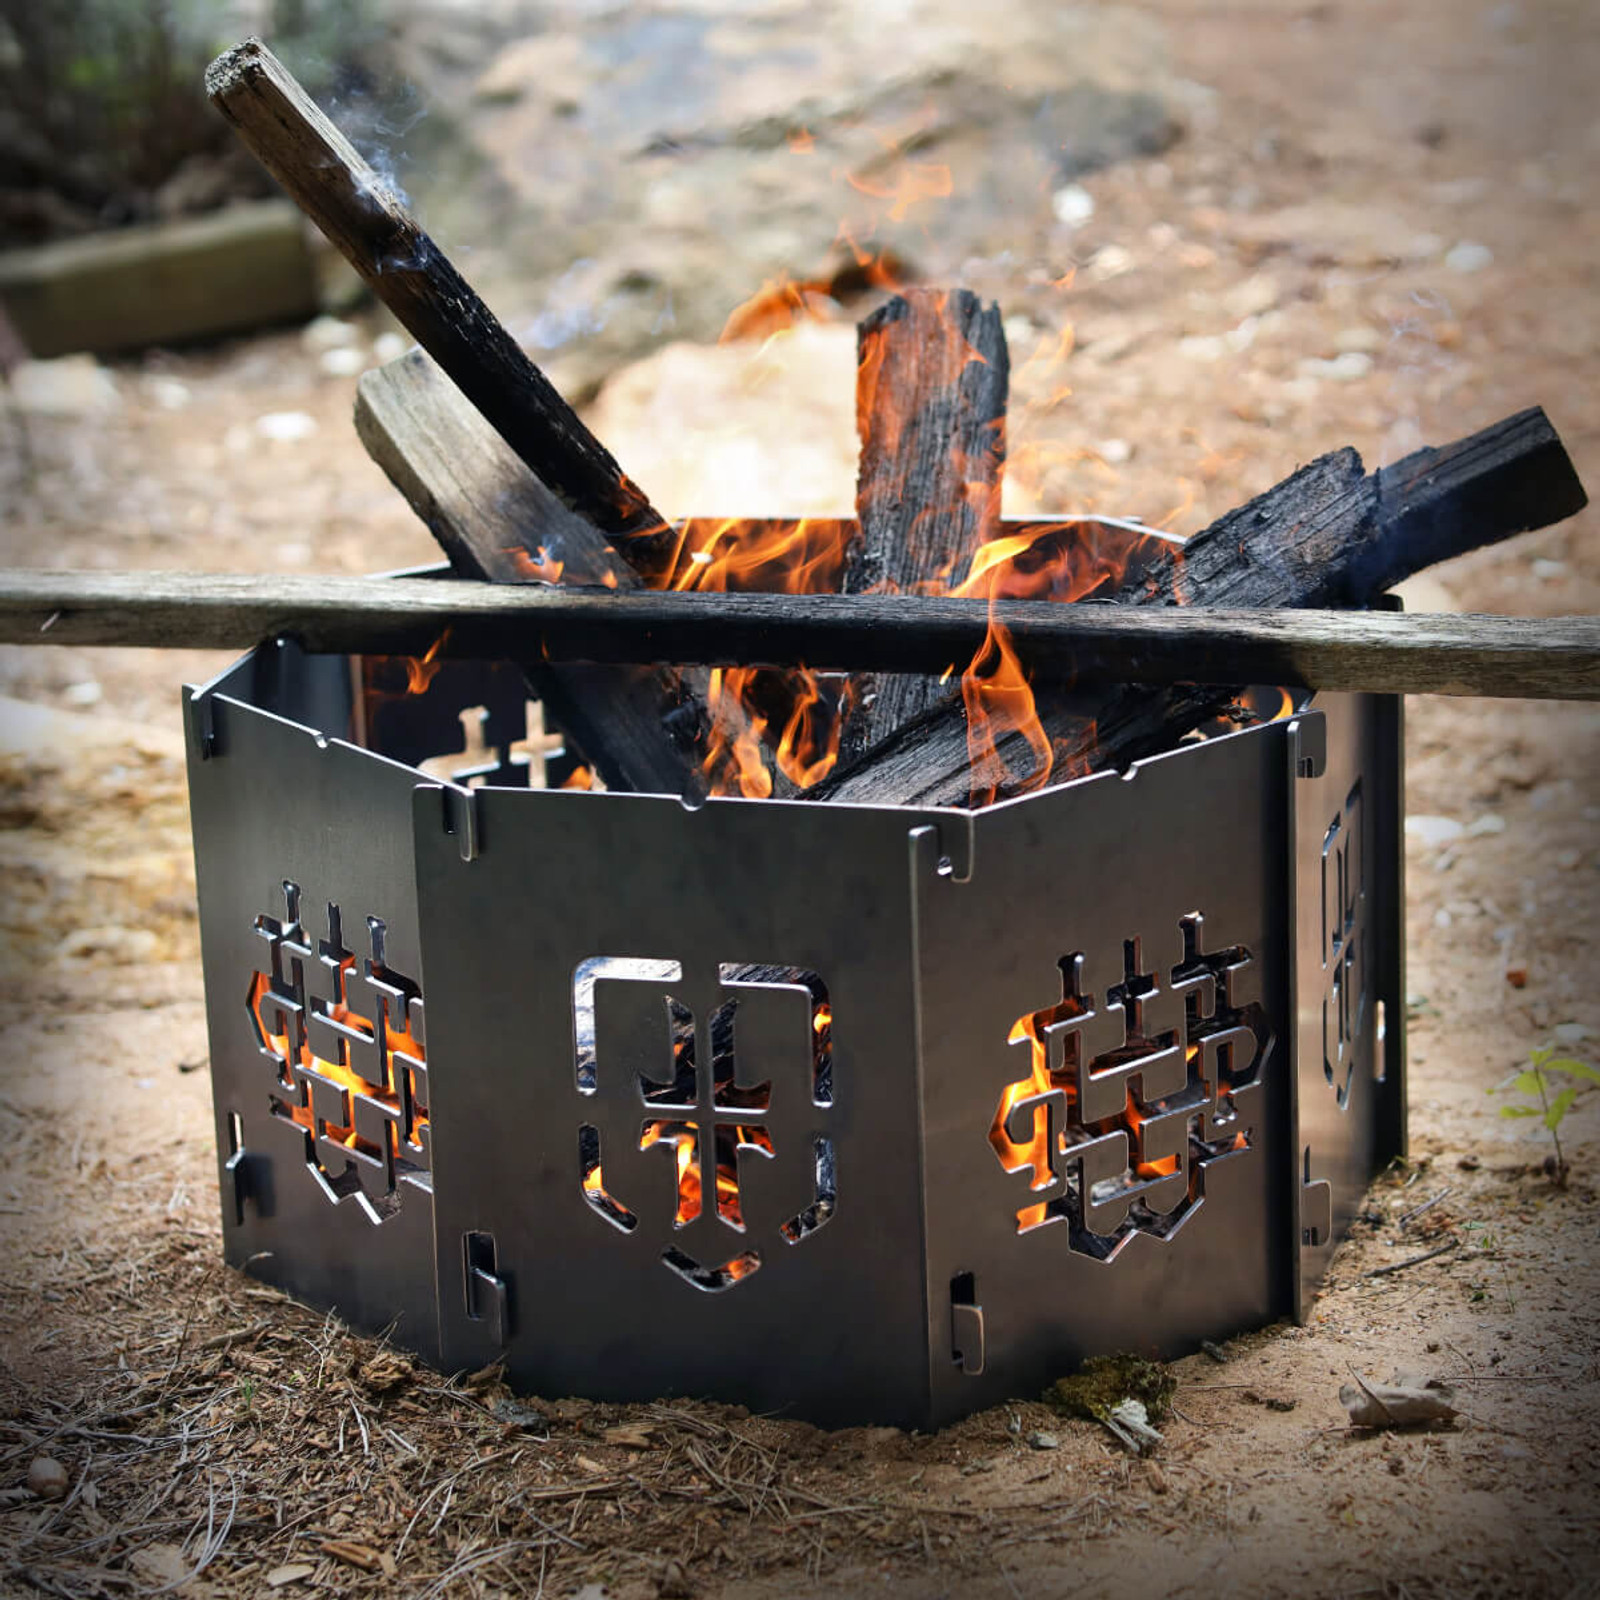 WPS Octagon - Firebox (No Grate or Skillet)